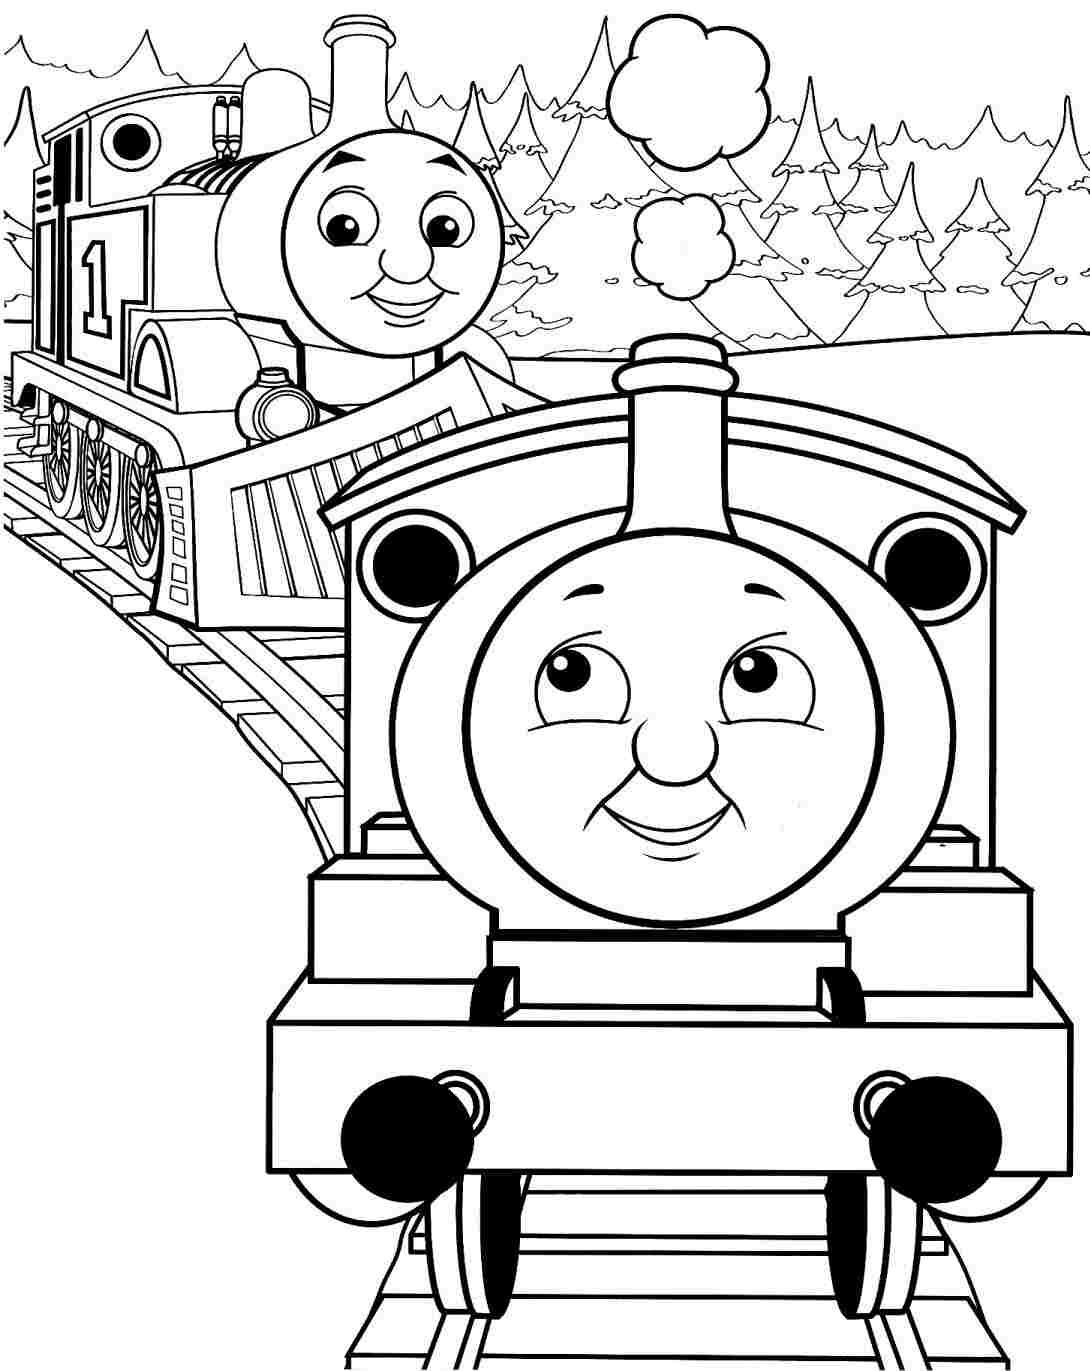 Kereta Api Sketsa : kereta, sketsa, Simple, Thomas, Train, Coloring, Pages, Hunro, Pages,, Books,, Truck